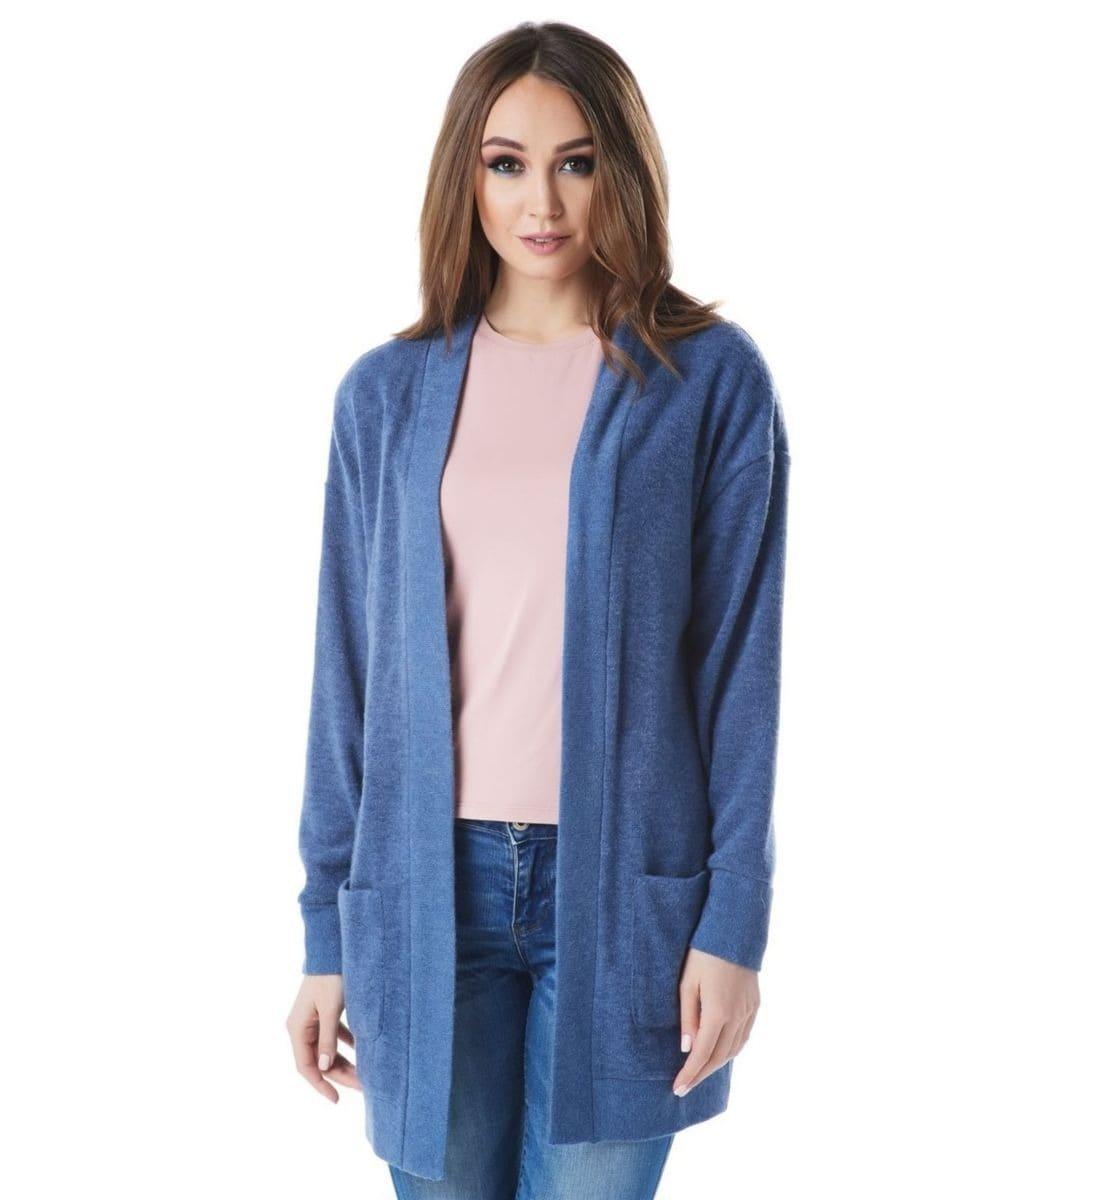 Шерстяной жакет голубого цвета   Lala Style1441